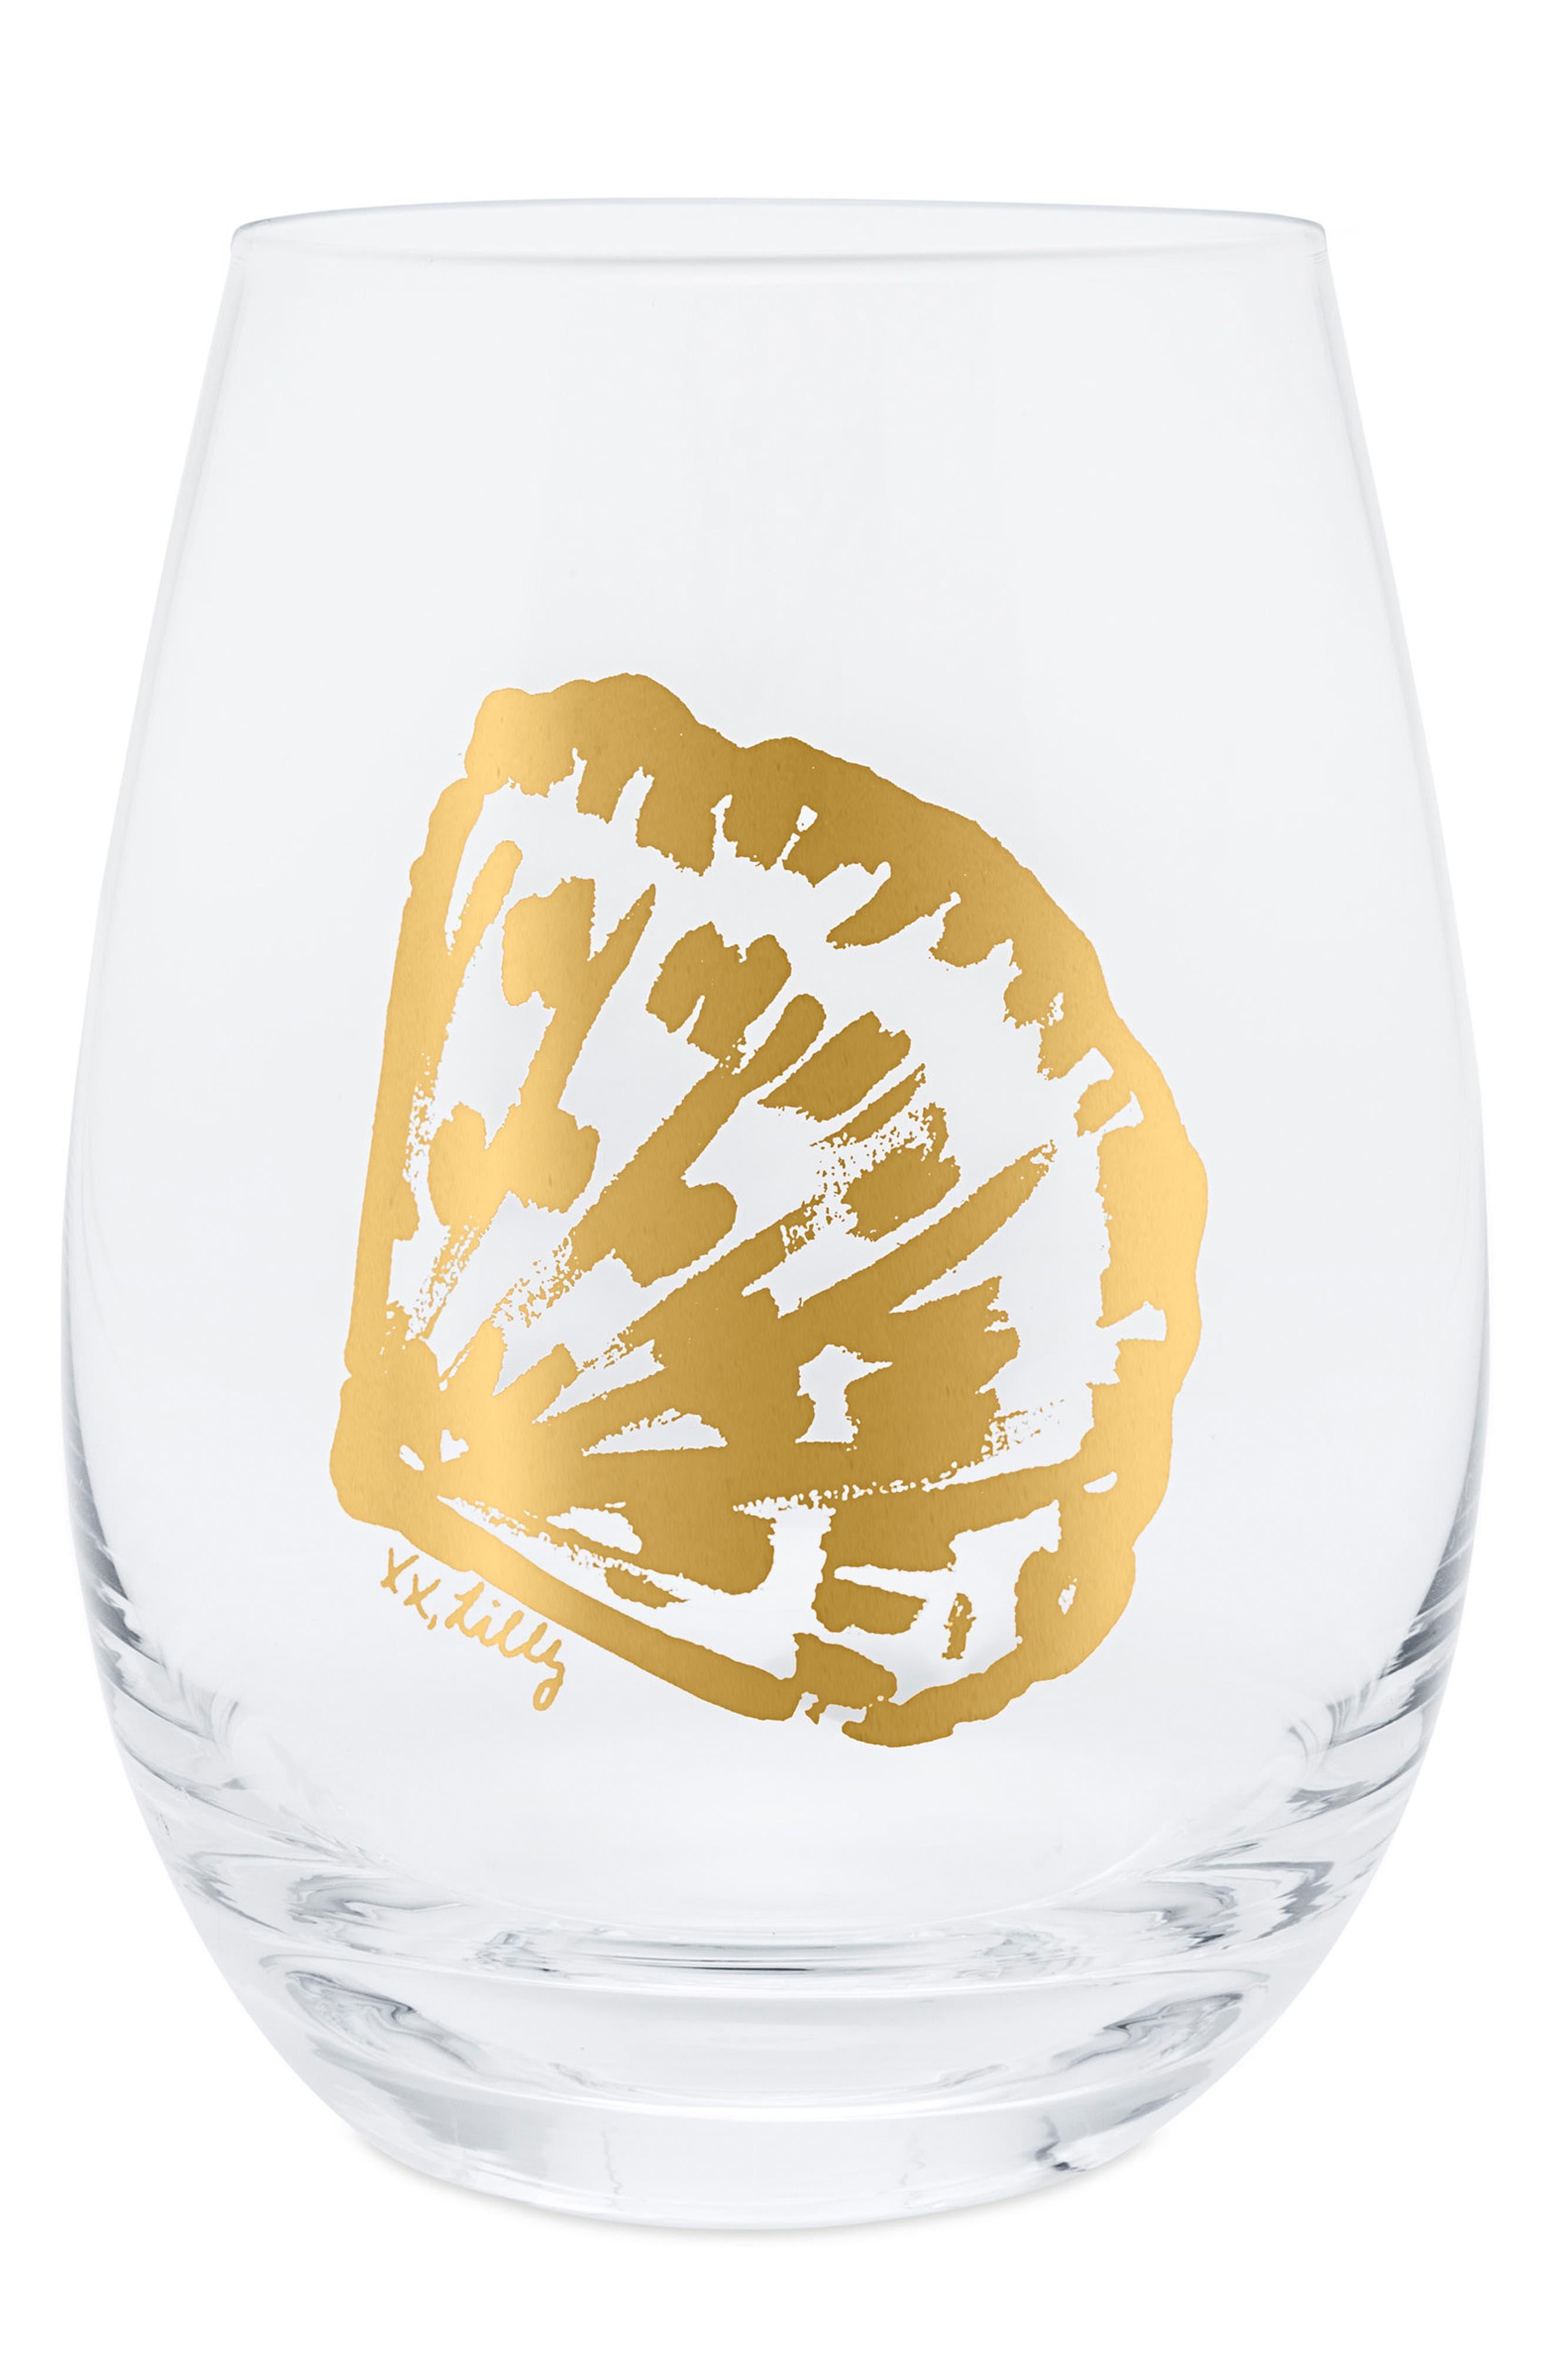 Set of 2 Stemless Wine Glasses,                             Alternate thumbnail 2, color,                             Metallic Gold